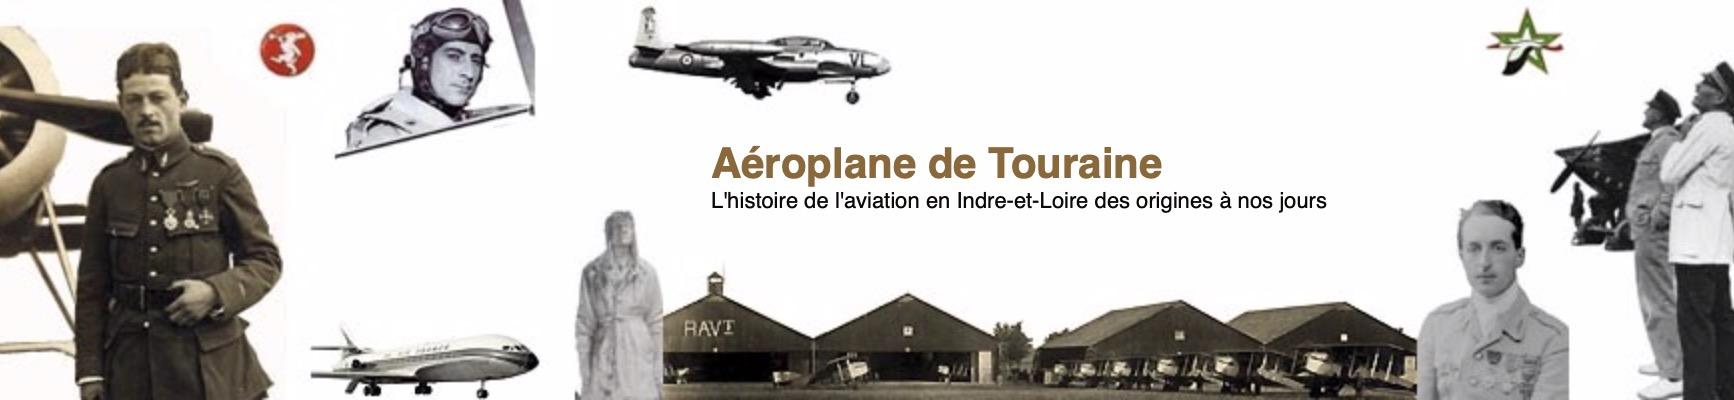 Aéroplane de Touraine